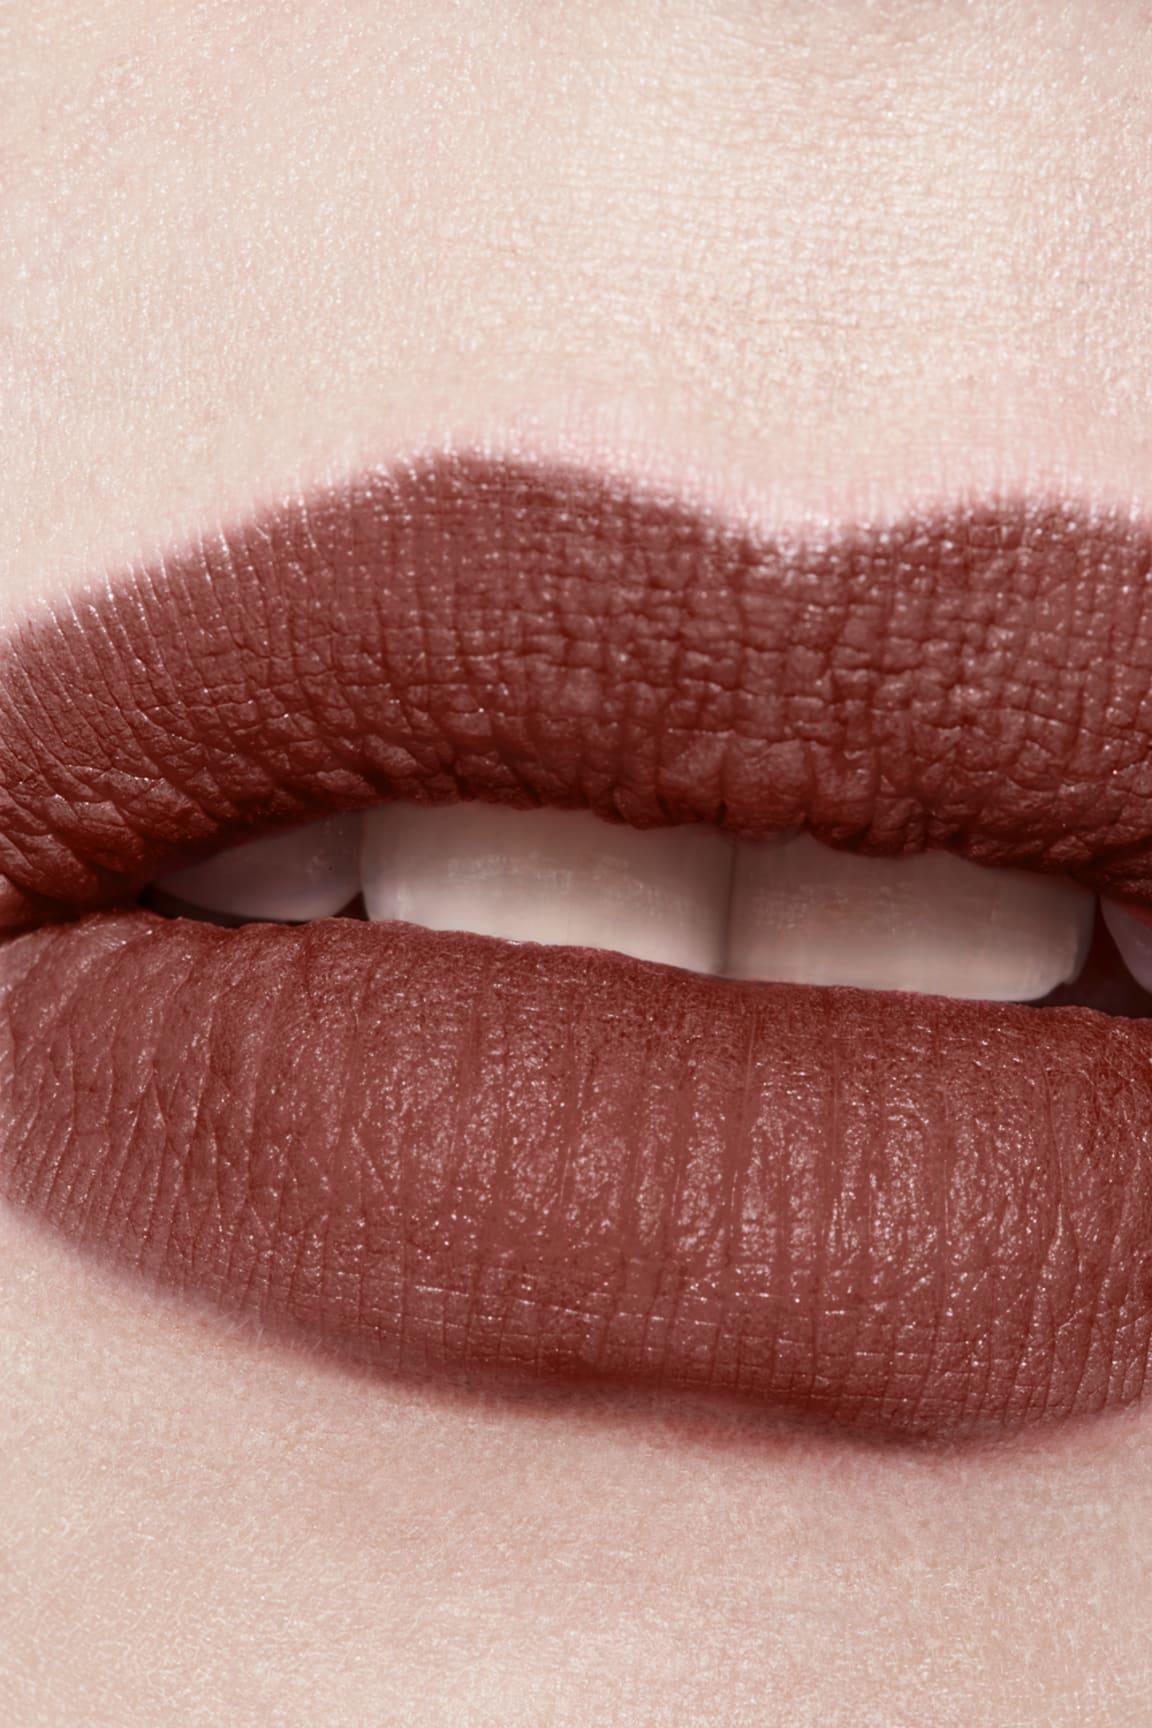 Application makeup visual 3 - ROUGE ALLURE INK FUSION 834 - AMBIGUÏTÉ